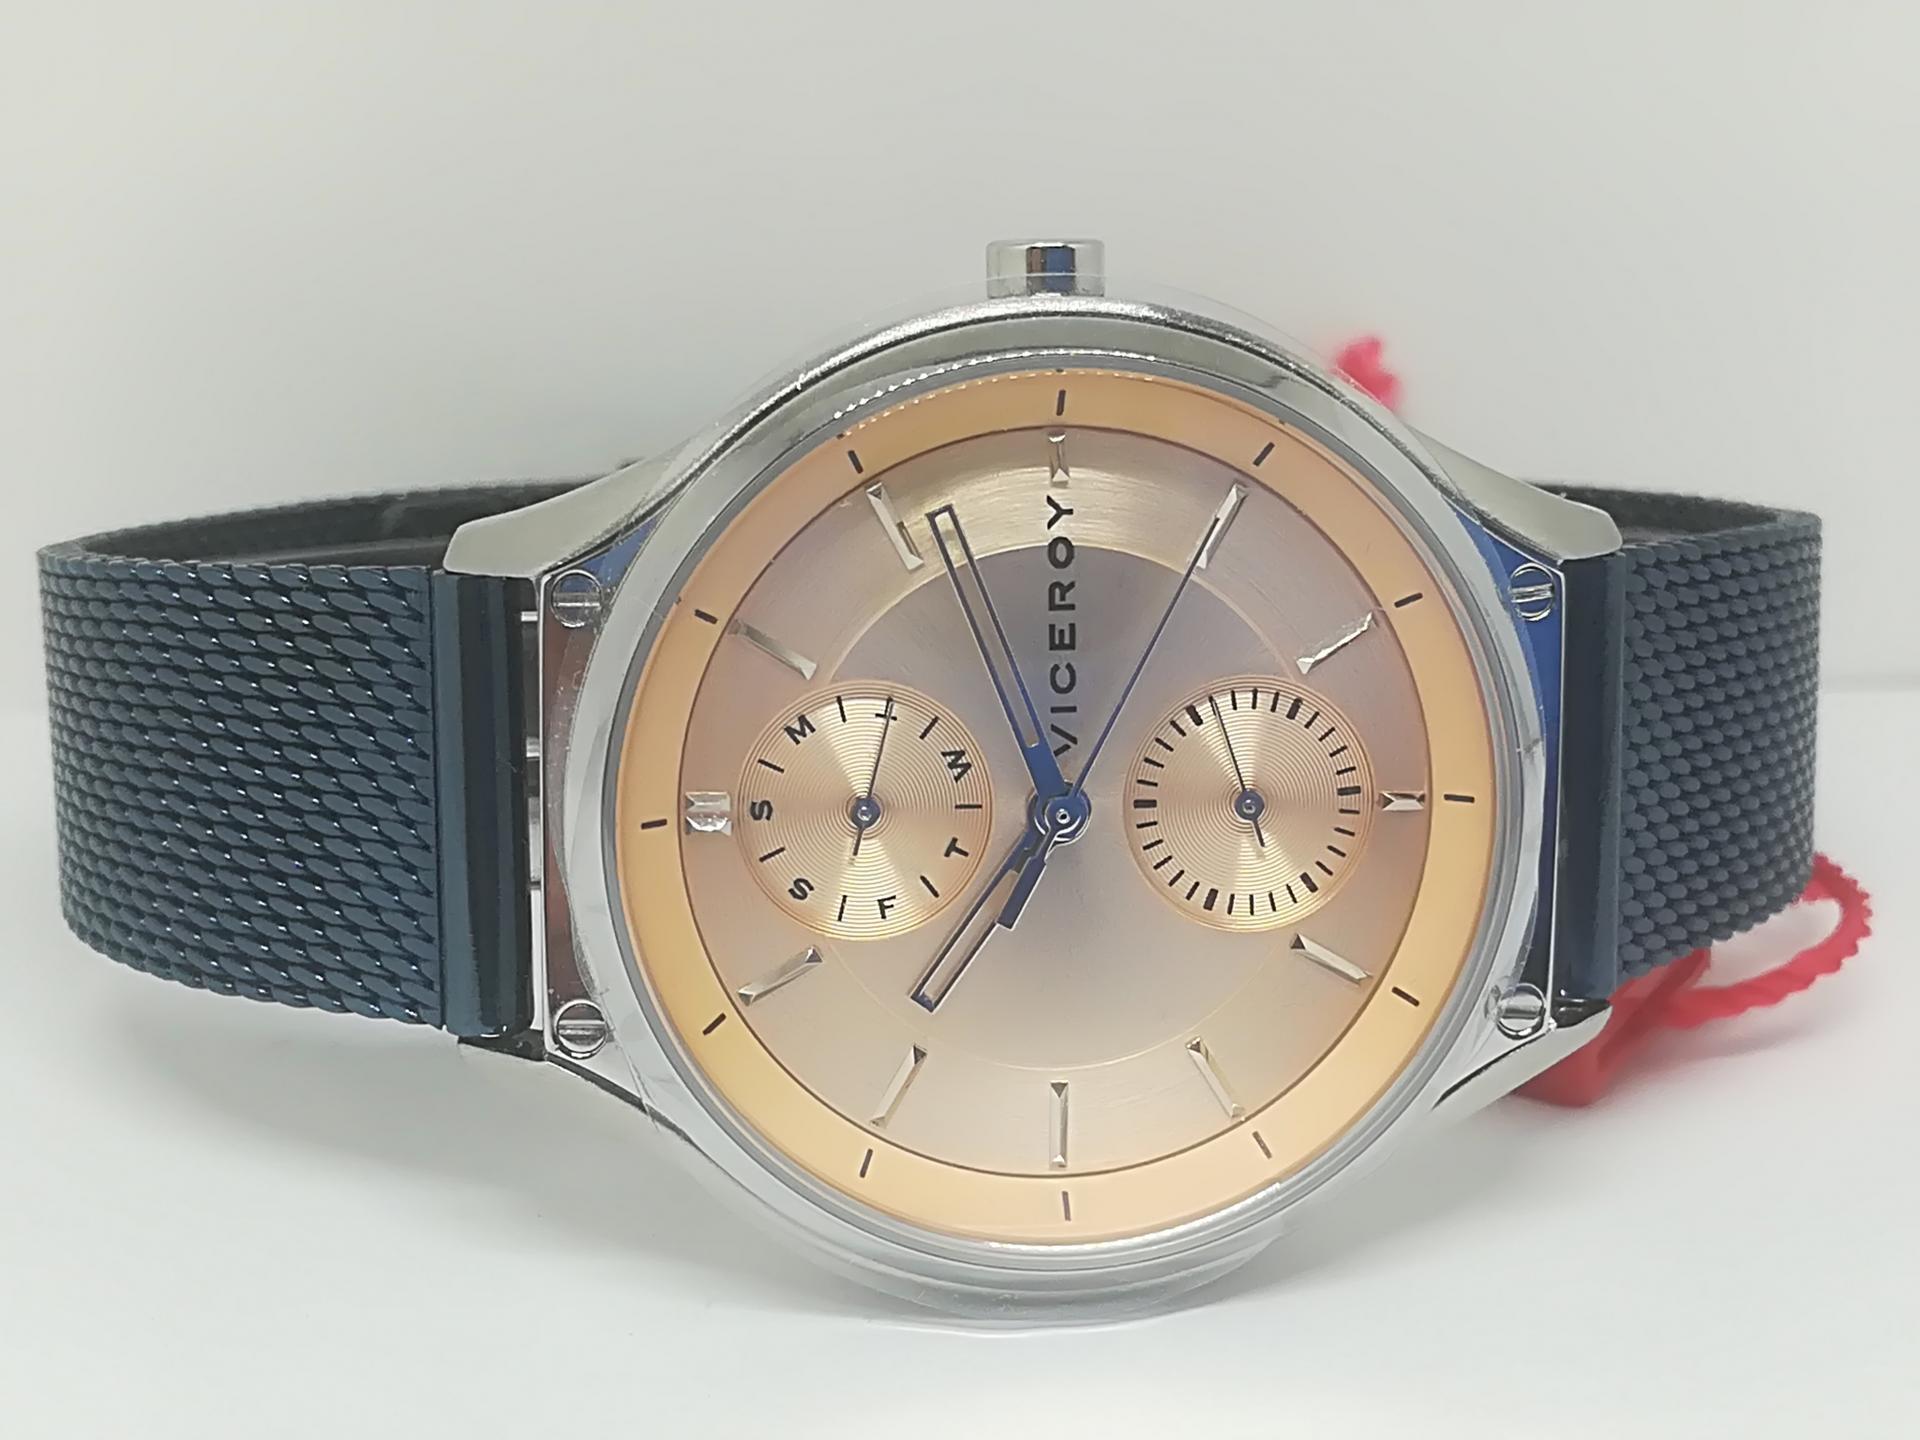 Reloj Viceroy Mujer Multifuncion Acero IP Azul 471194-97